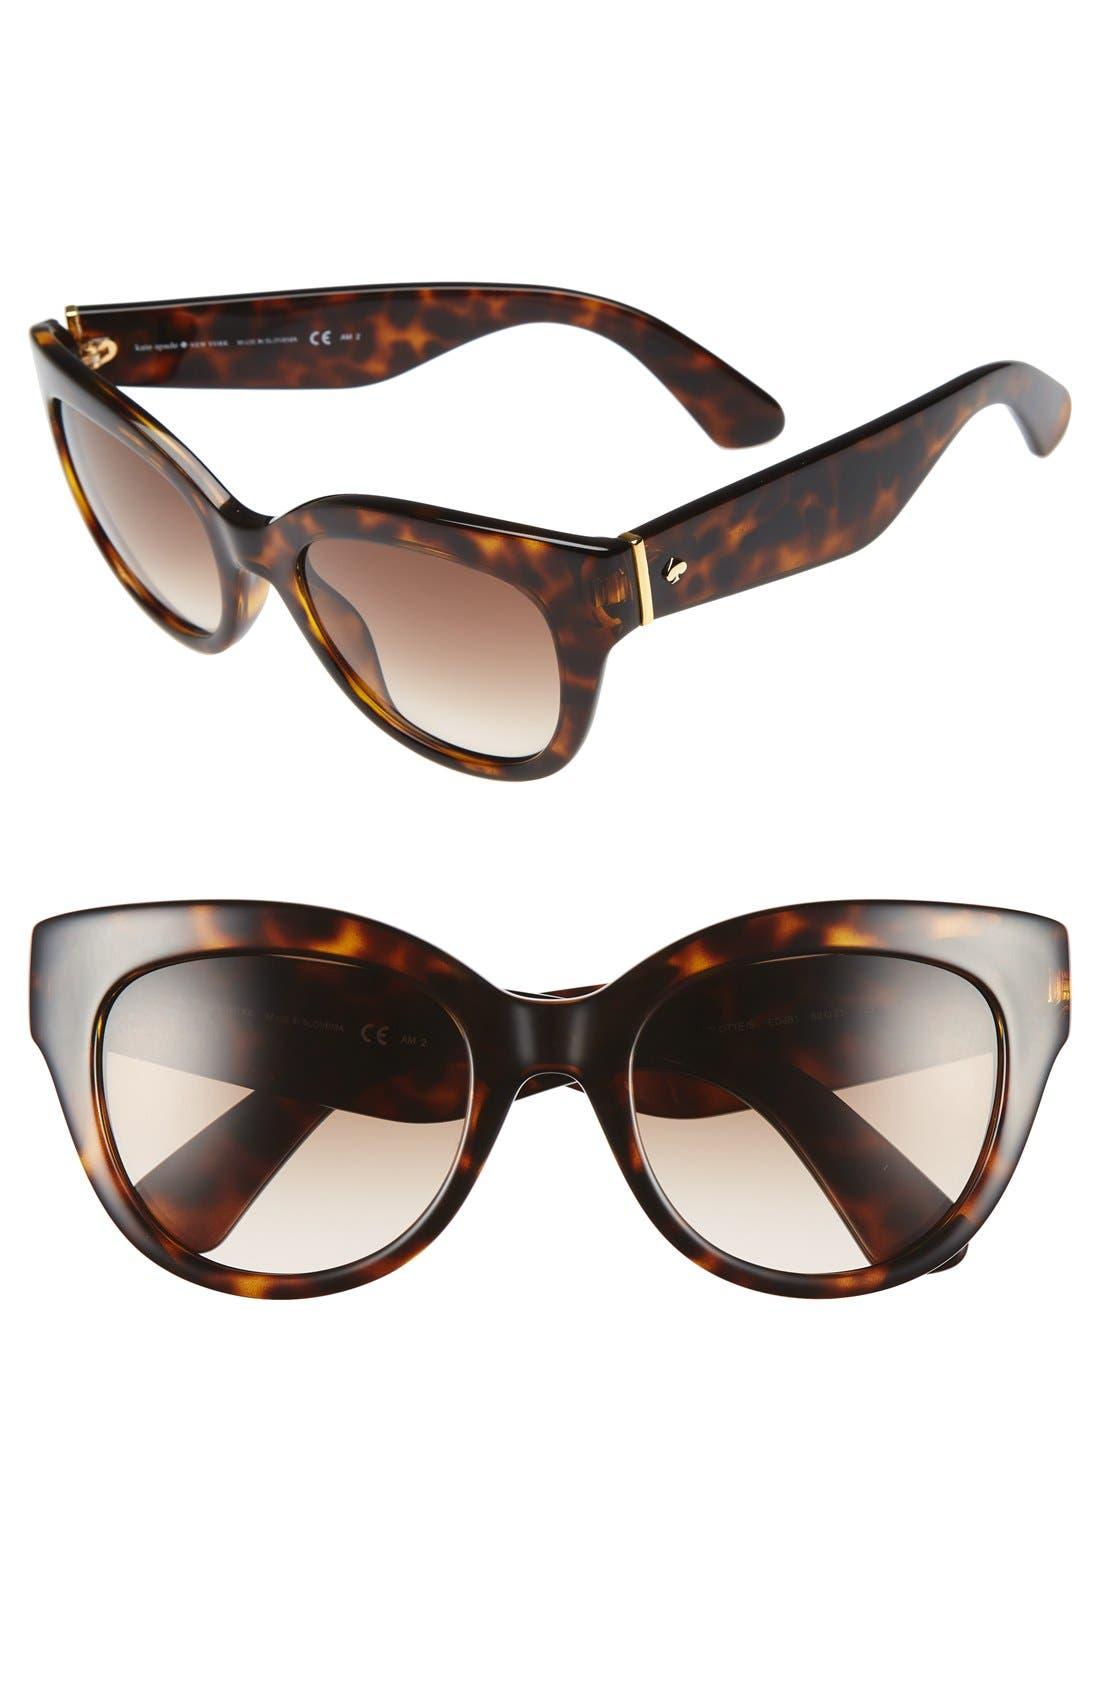 KATE SPADE NEW YORK 'sharlots' 52mm sunglasses